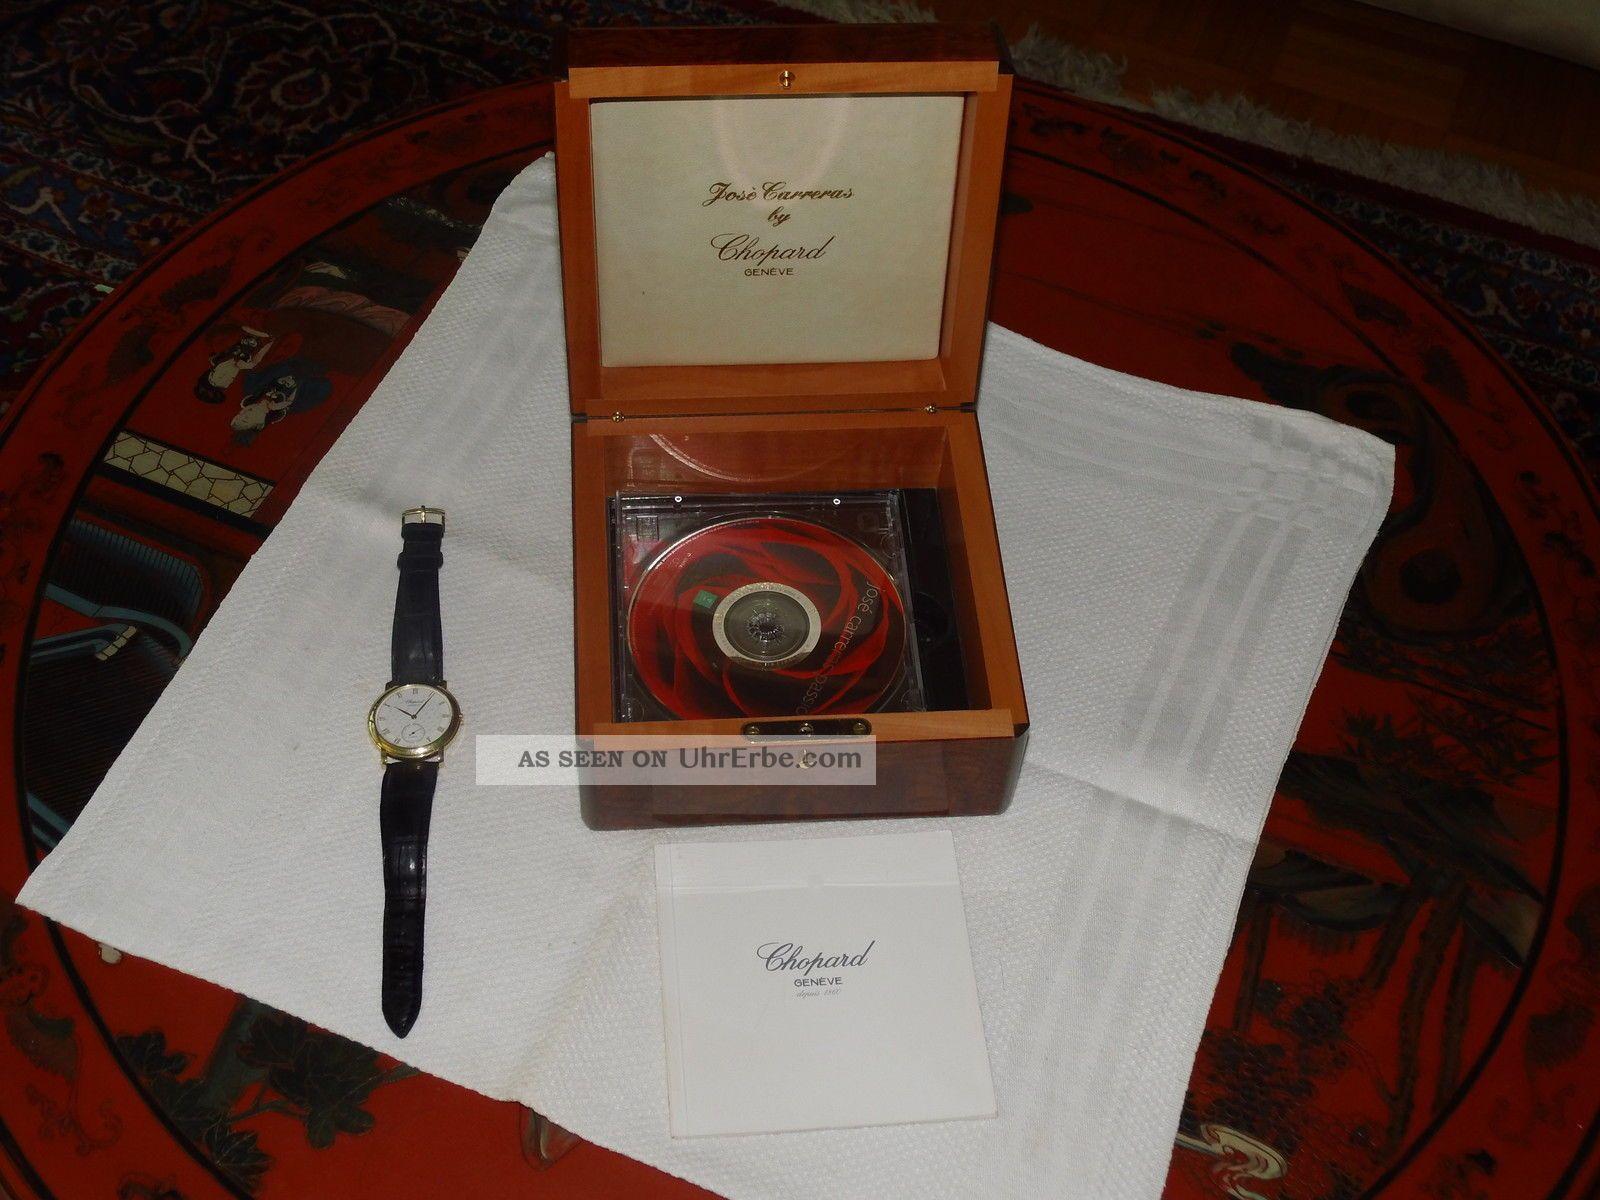 Sammlerstück Jose`carreras Uhr Aus 18ct Gold Motiv Wiener Staatsoper Armbanduhren Bild